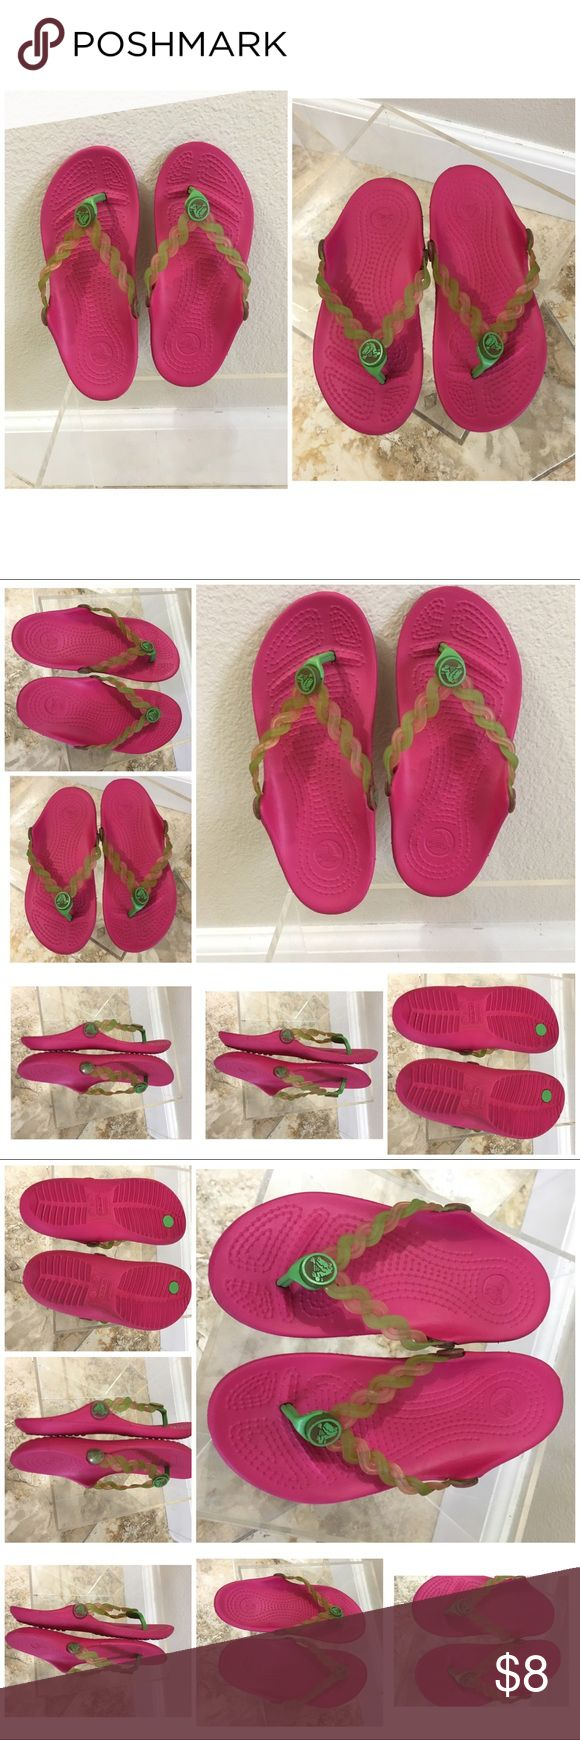 Crocs girls size 10 / 11 flip flops sandals pink Crocs girls shoes size 10 / 11 flip flops sandals pink CROCS Shoes